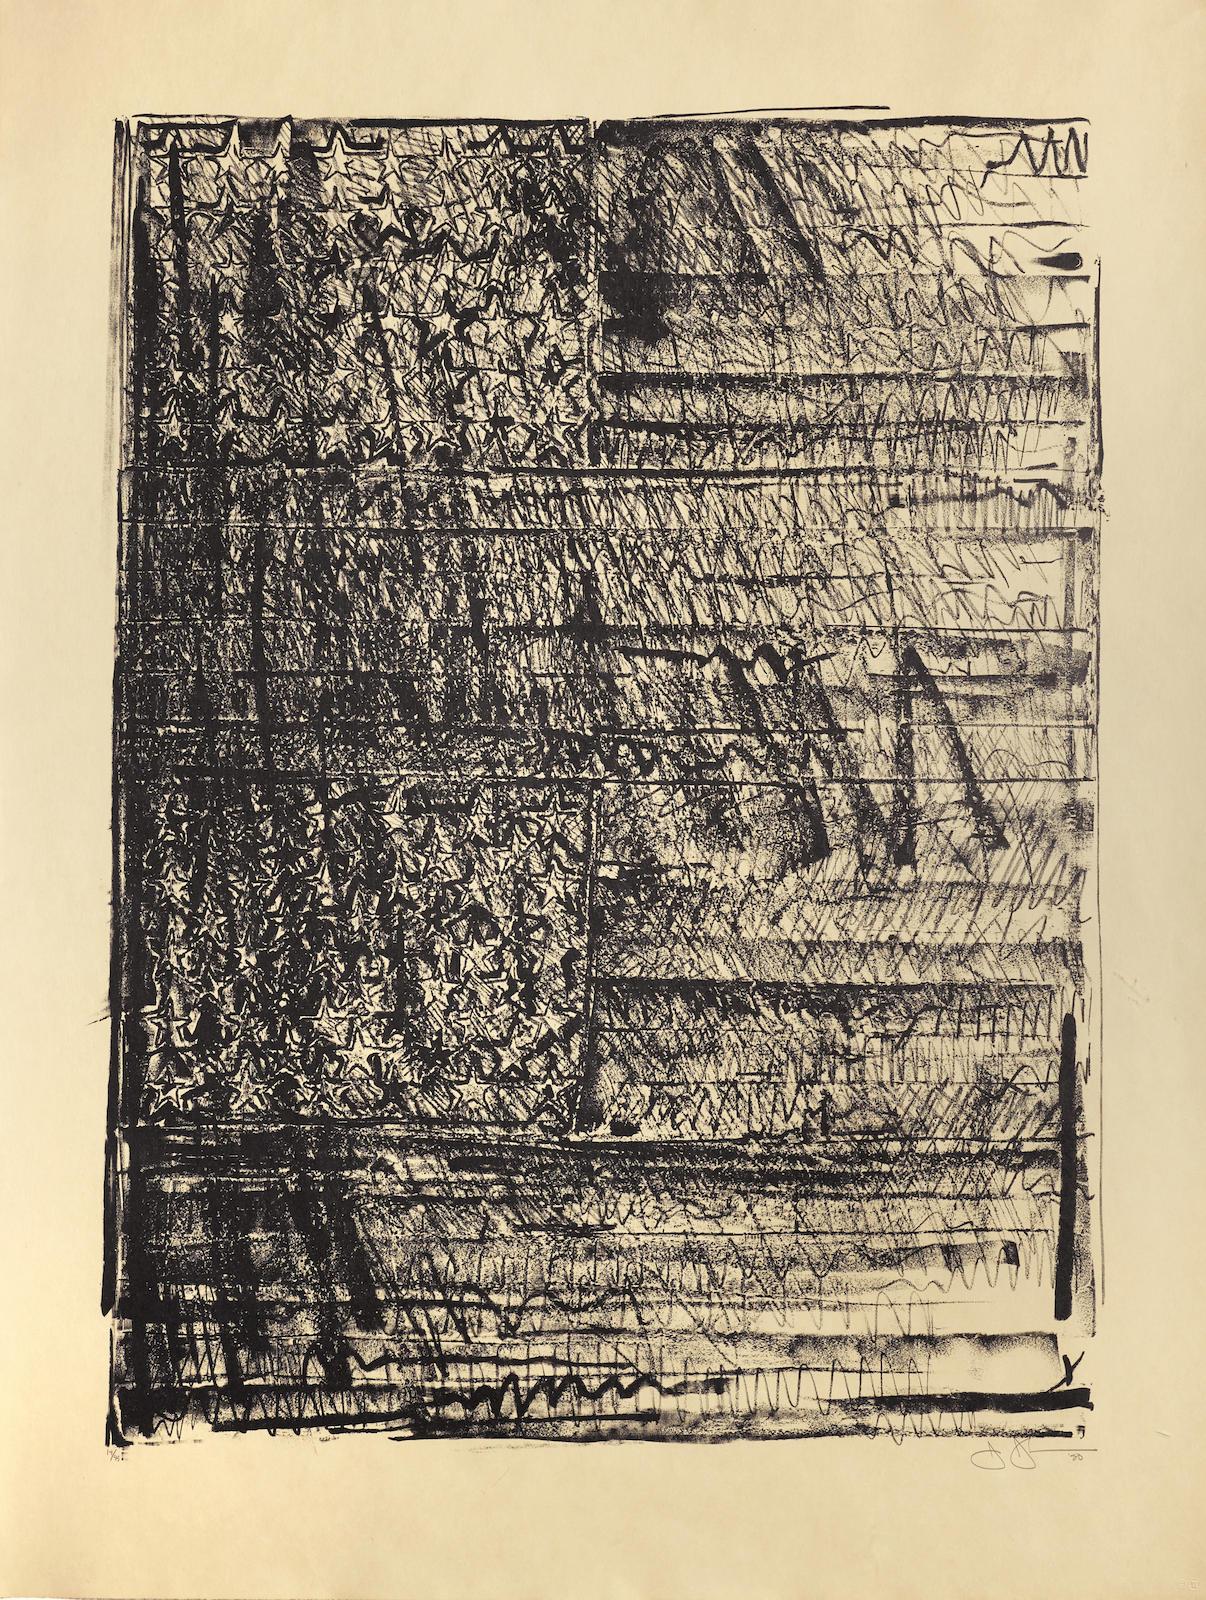 Jasper Johns-Two Flags (Ulae 212; G. 914)-1981